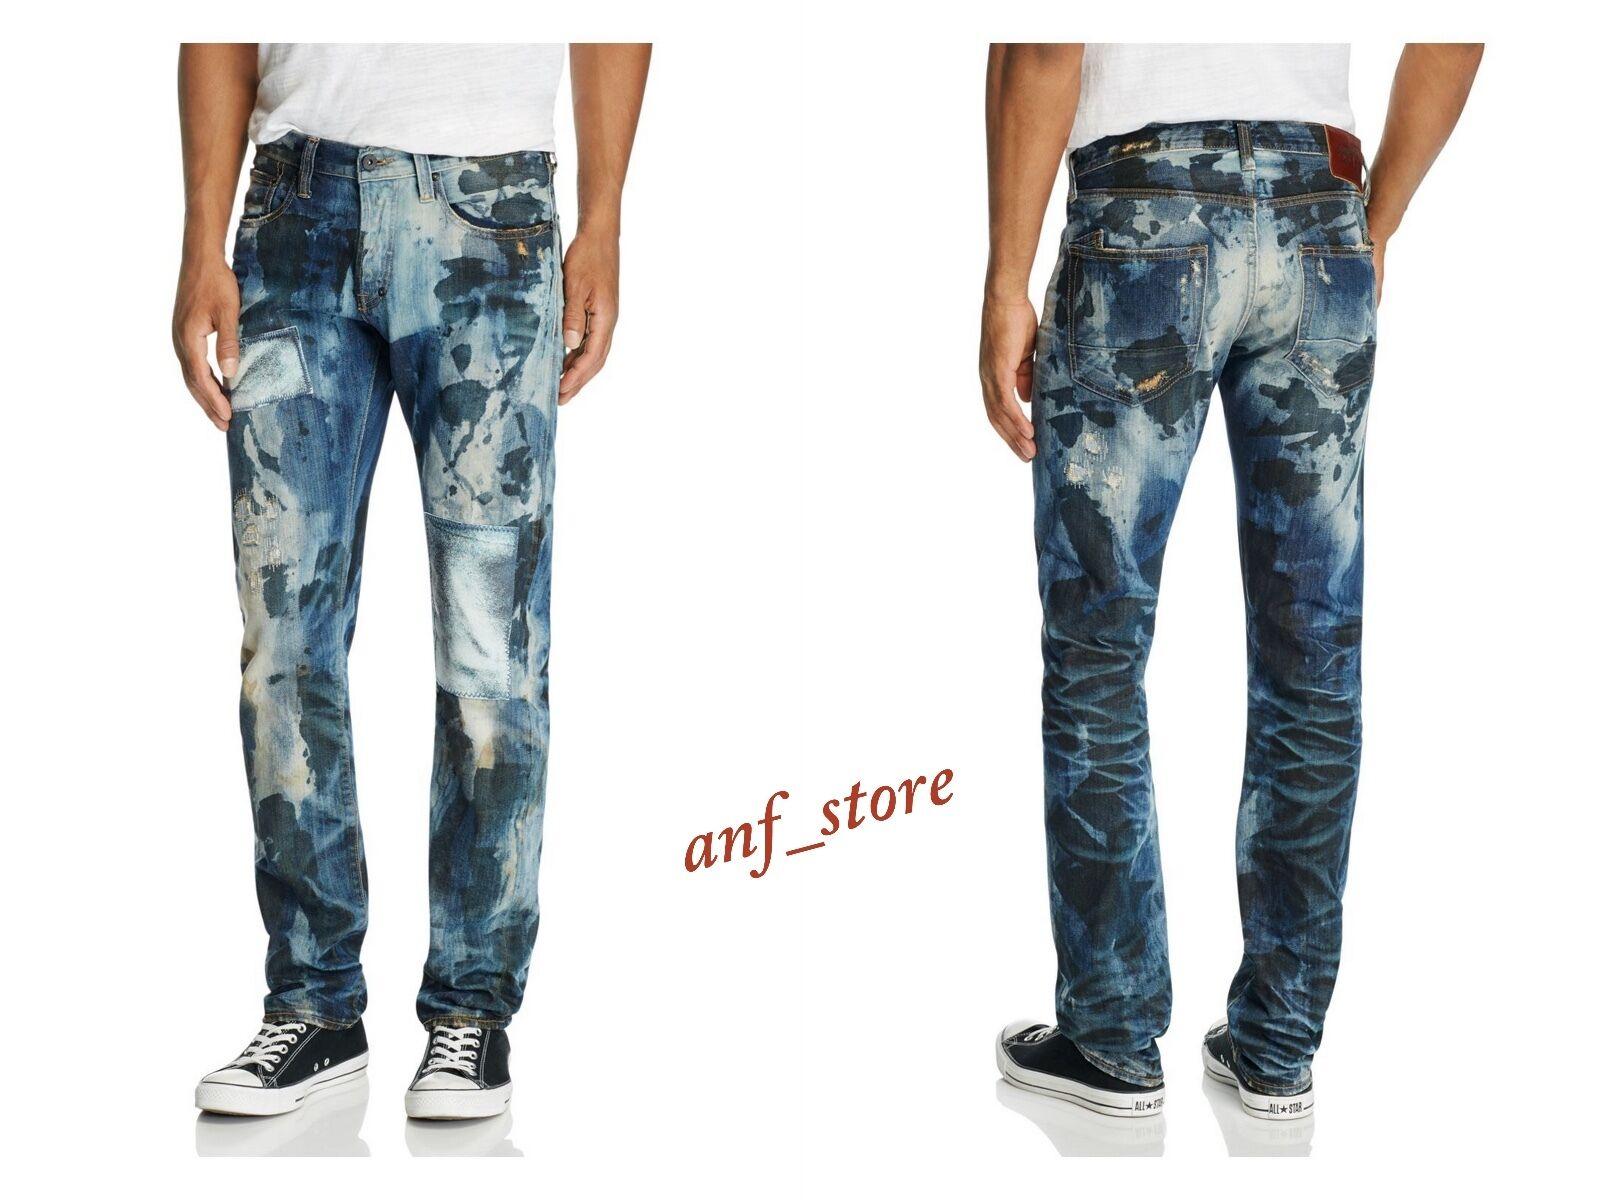 NWT PRPS Goods JAPAN Barracuda Straight Men Jeans 34 x 32 Patchwork Pixel